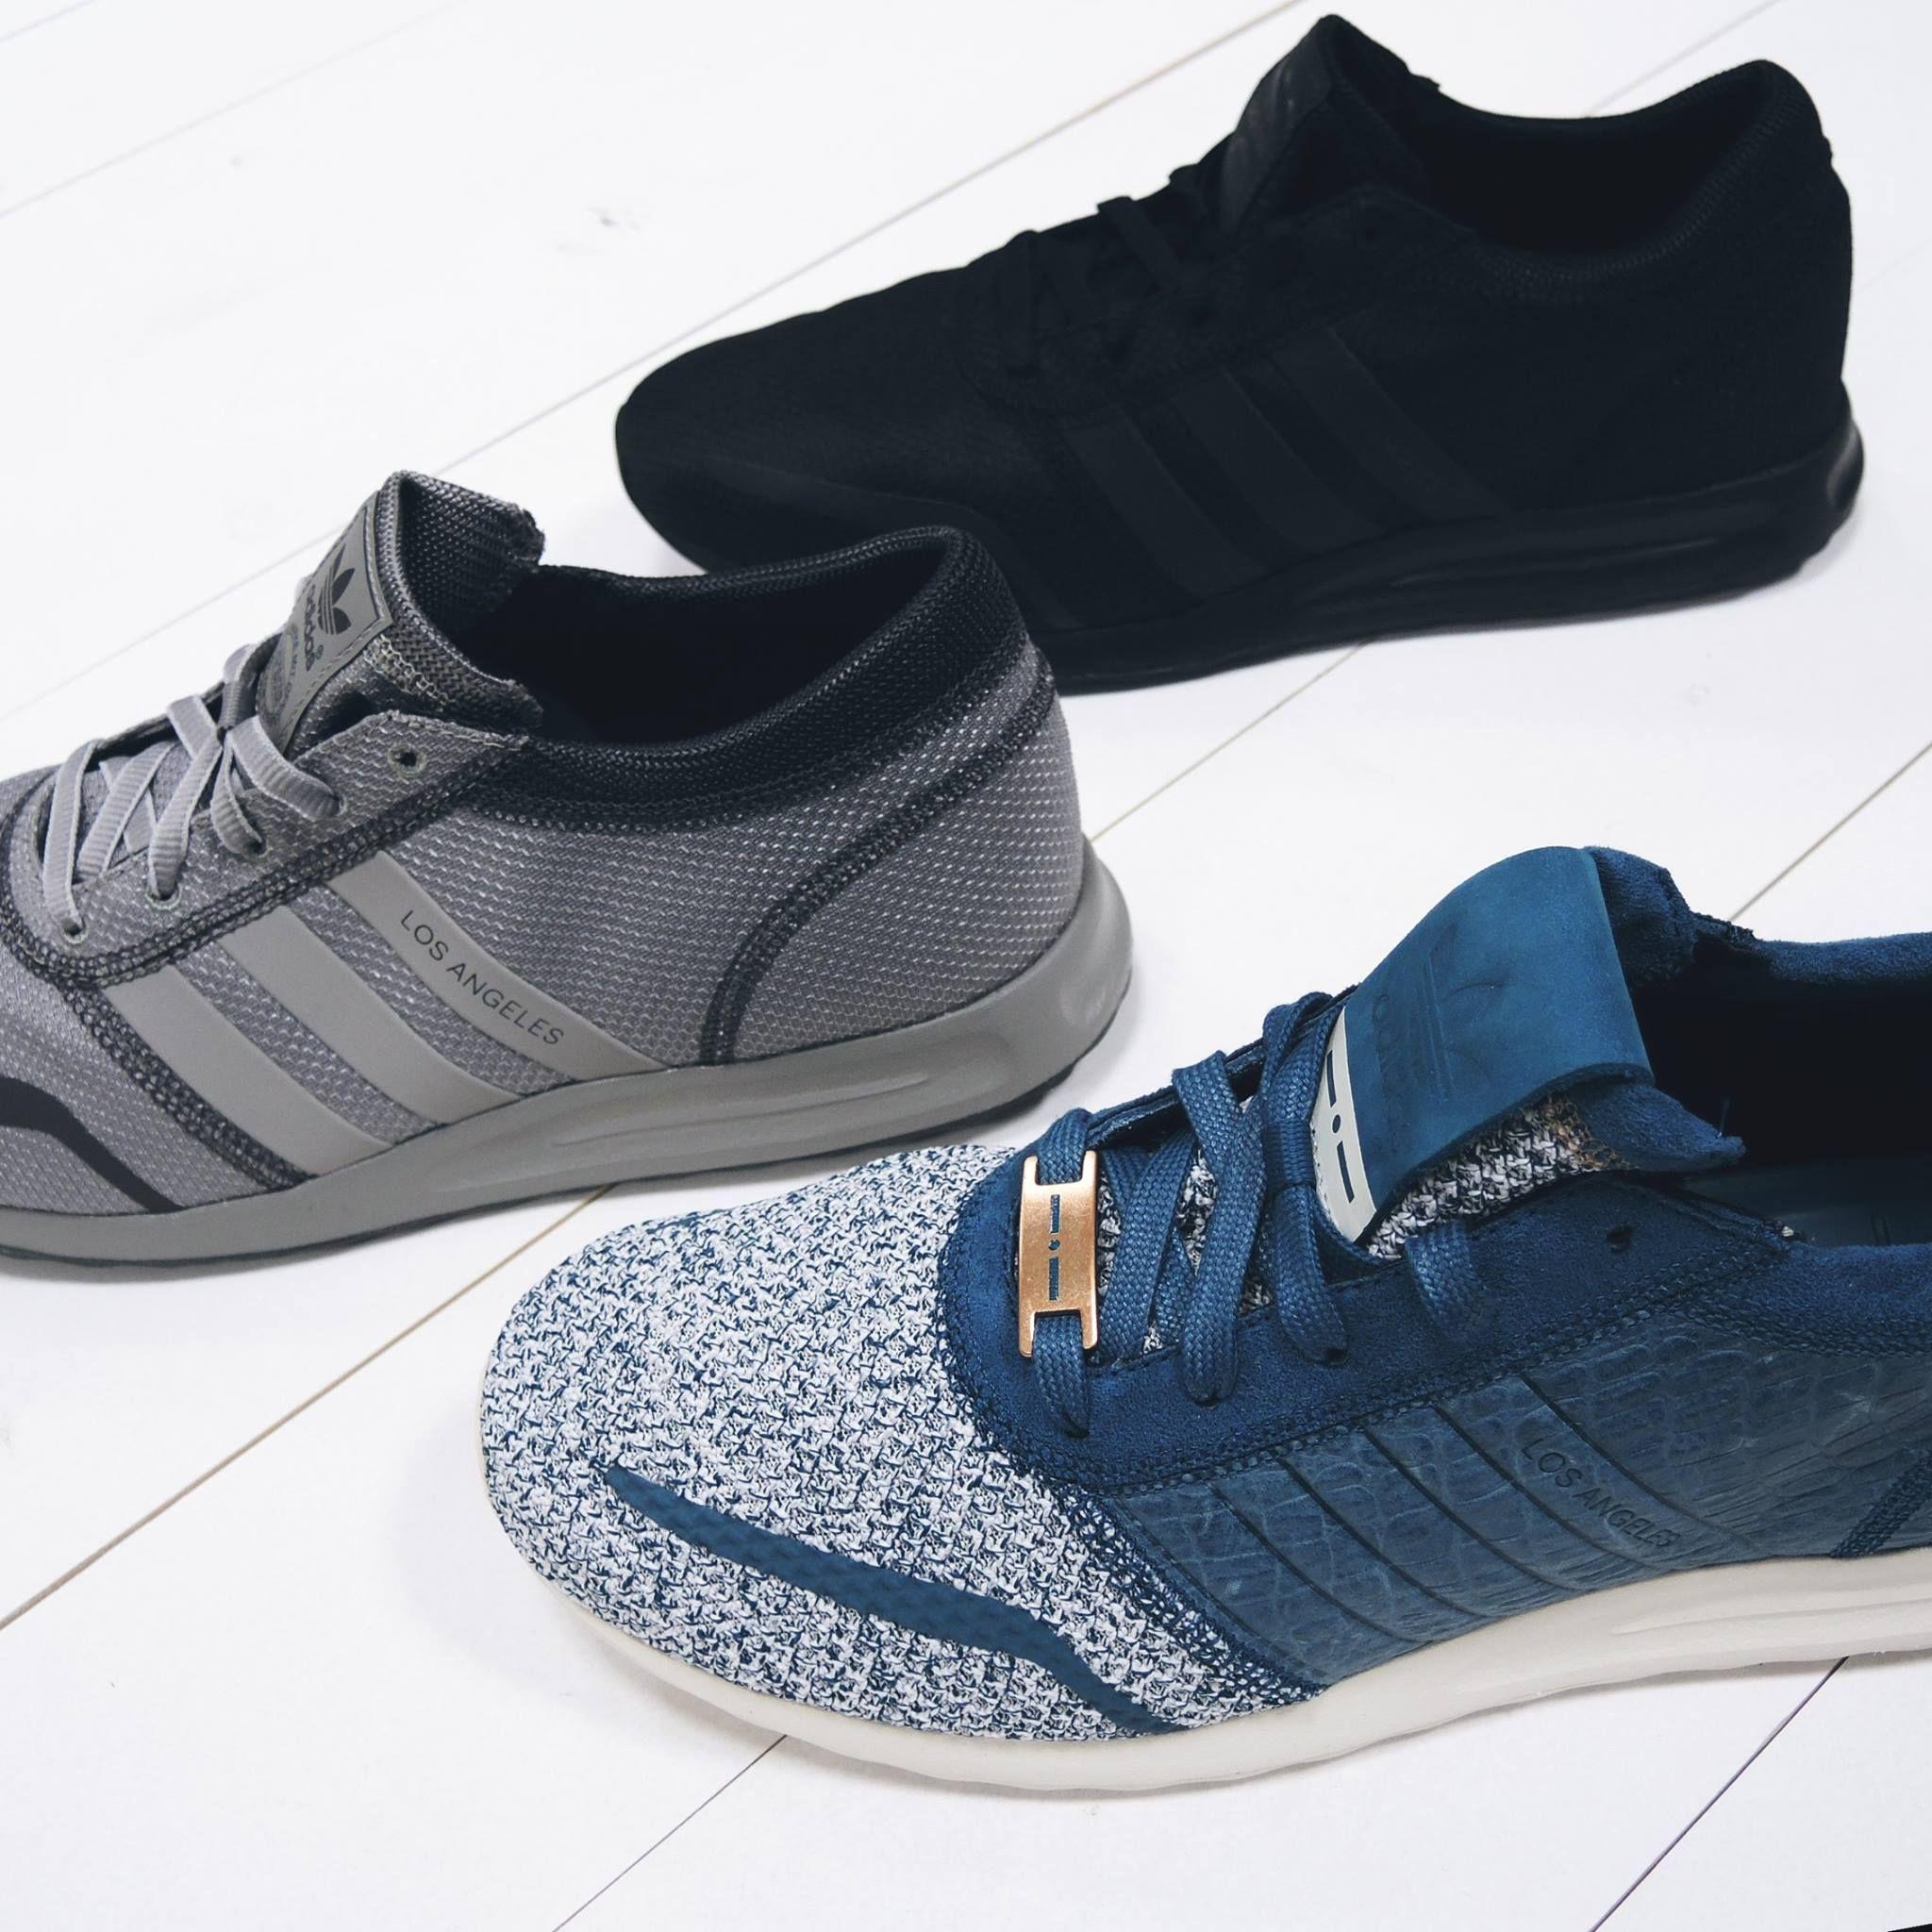 adidas superstar shop online italia